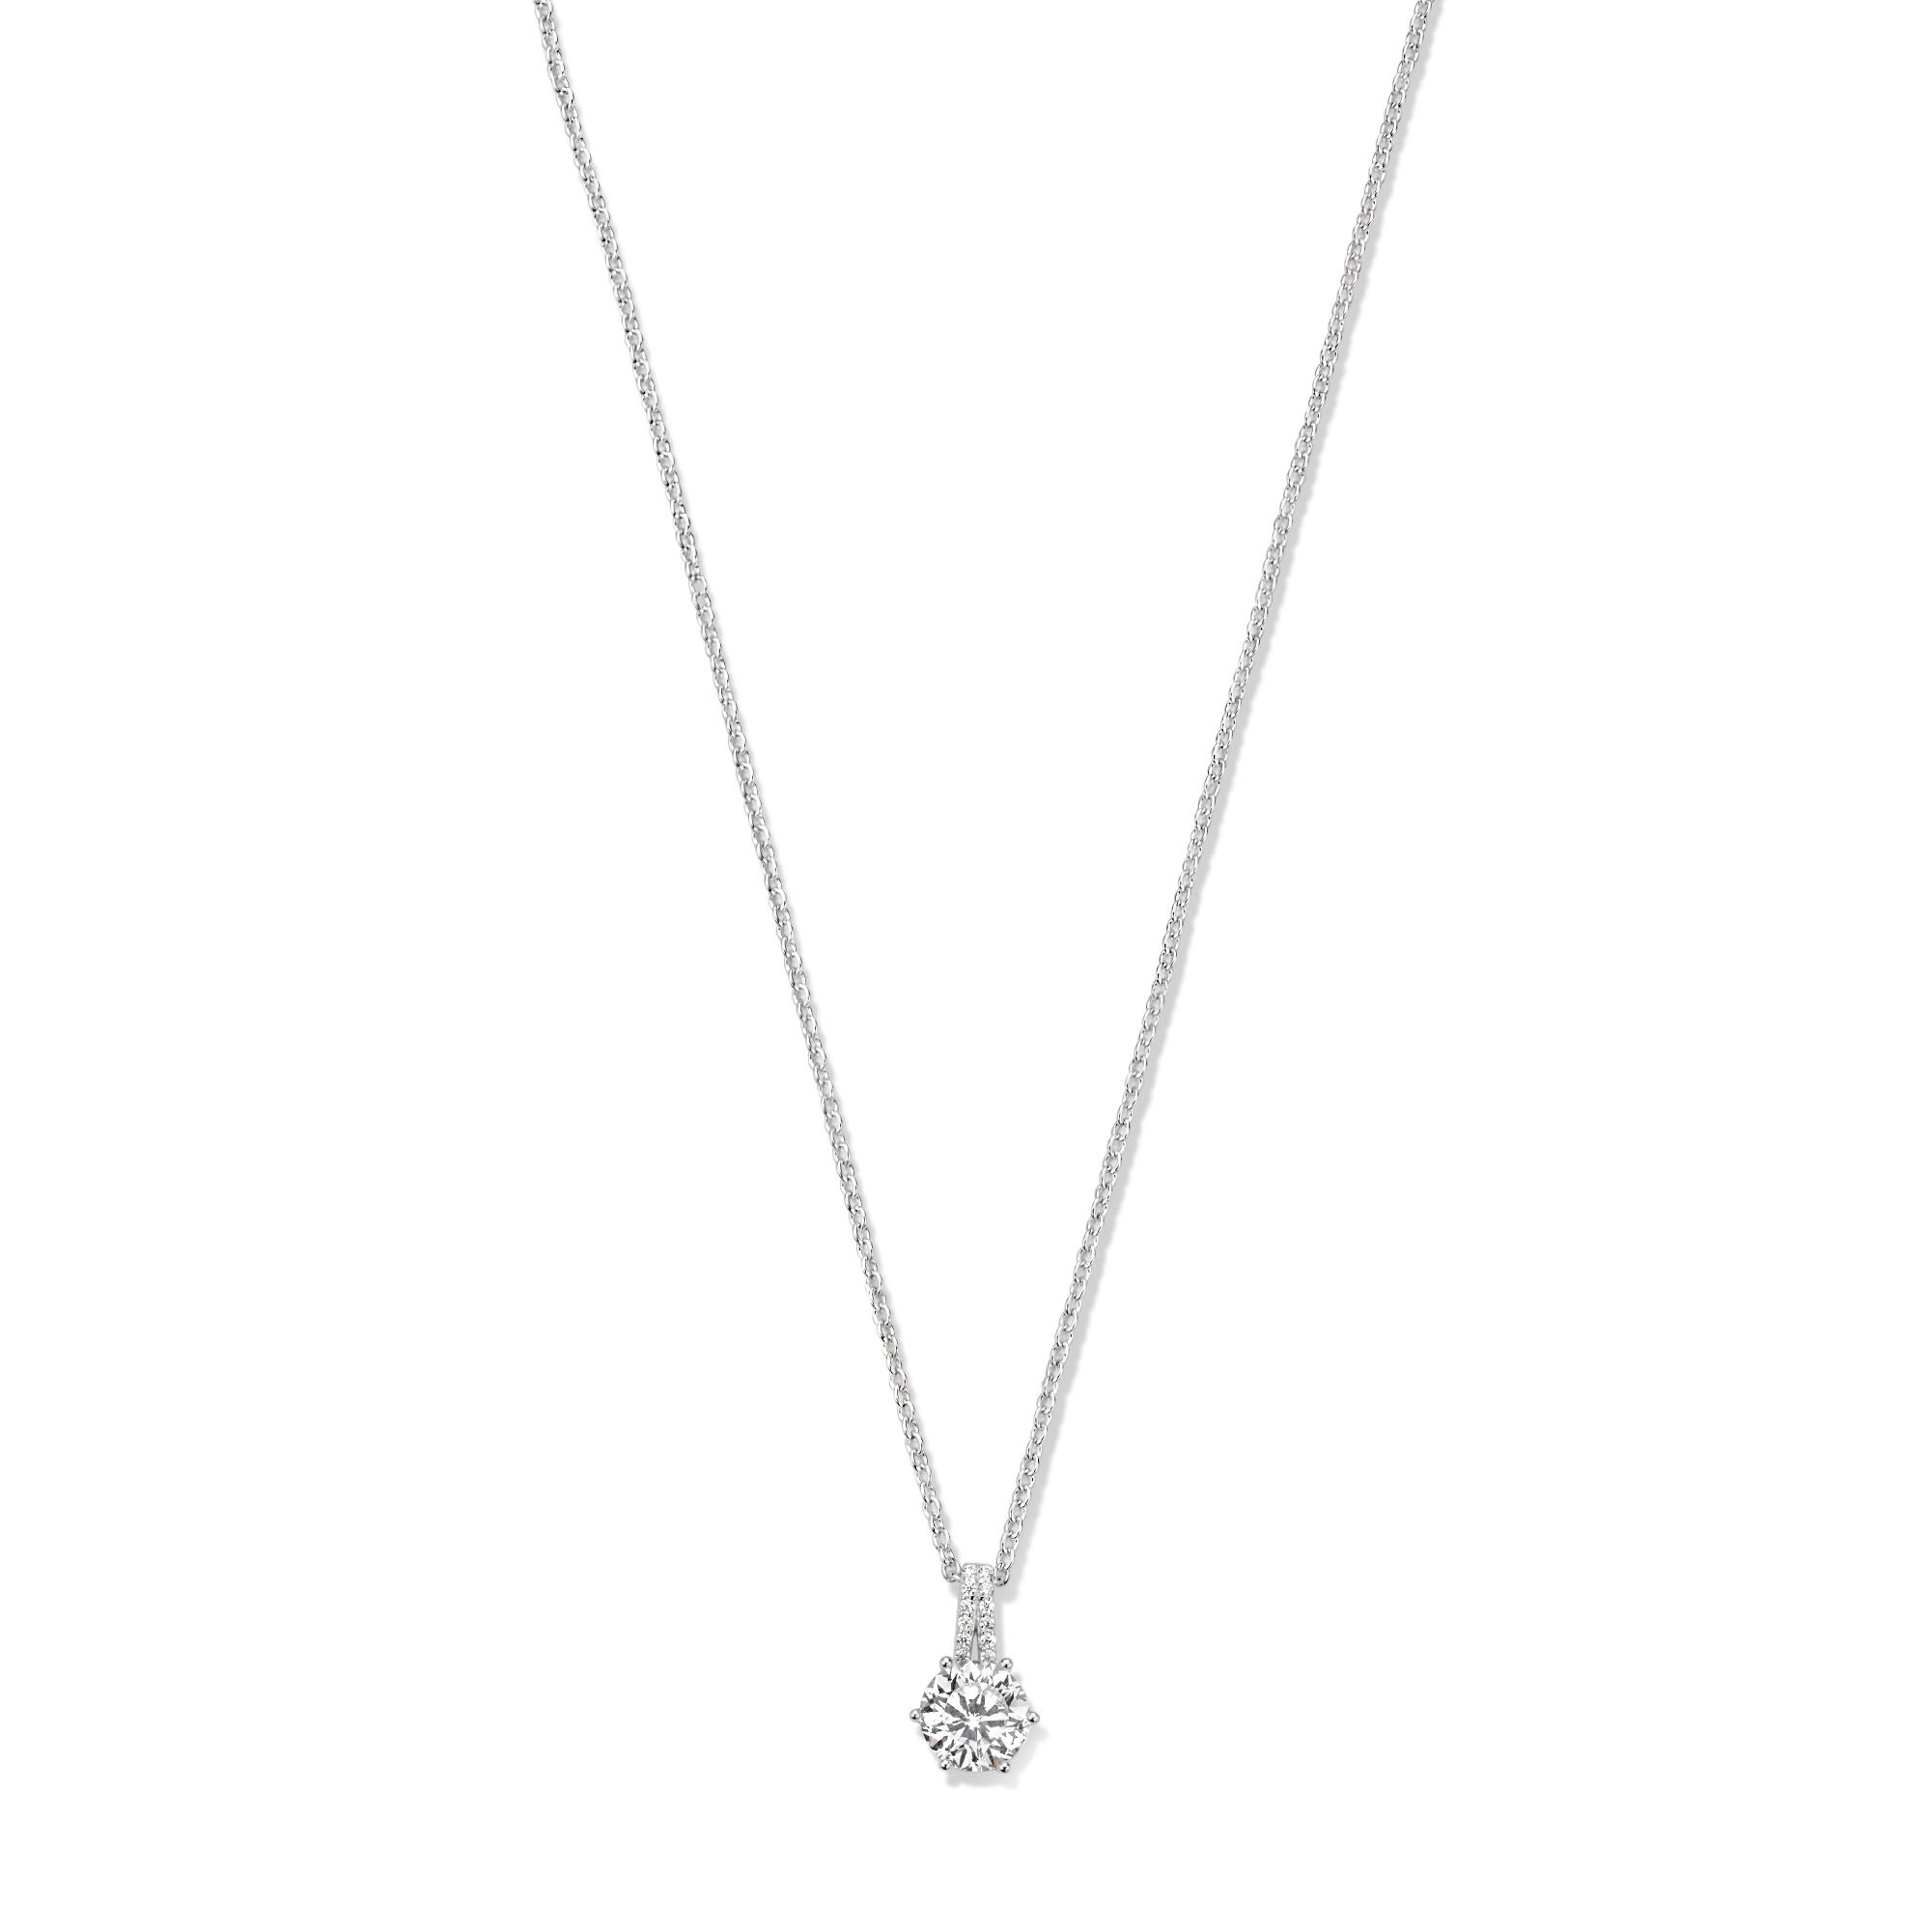 Parte di Me Bella Vita Sienna 925 sterling silver necklace with zirconia